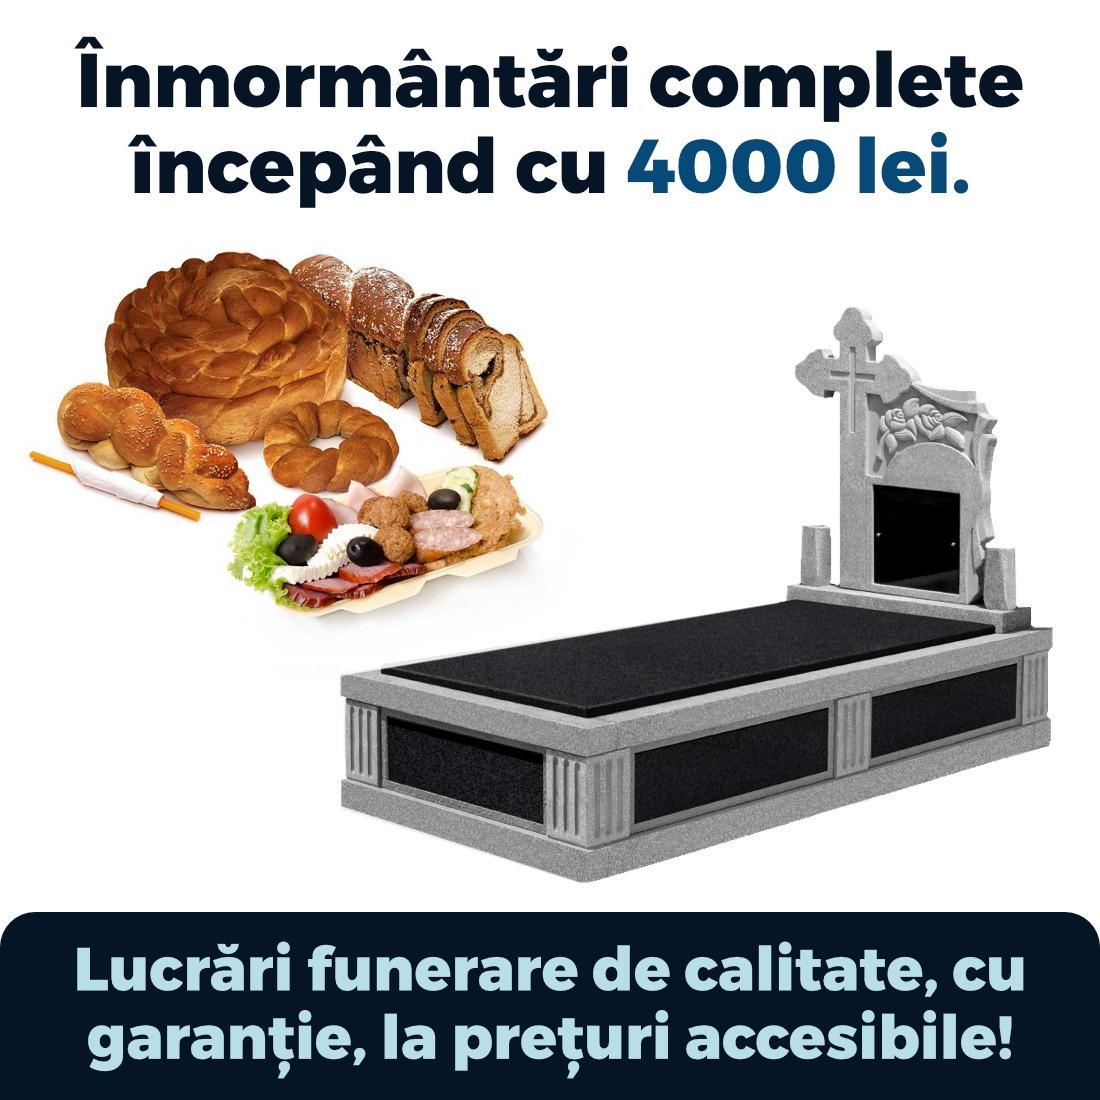 inmormantari complete incepand cu 4000 lei